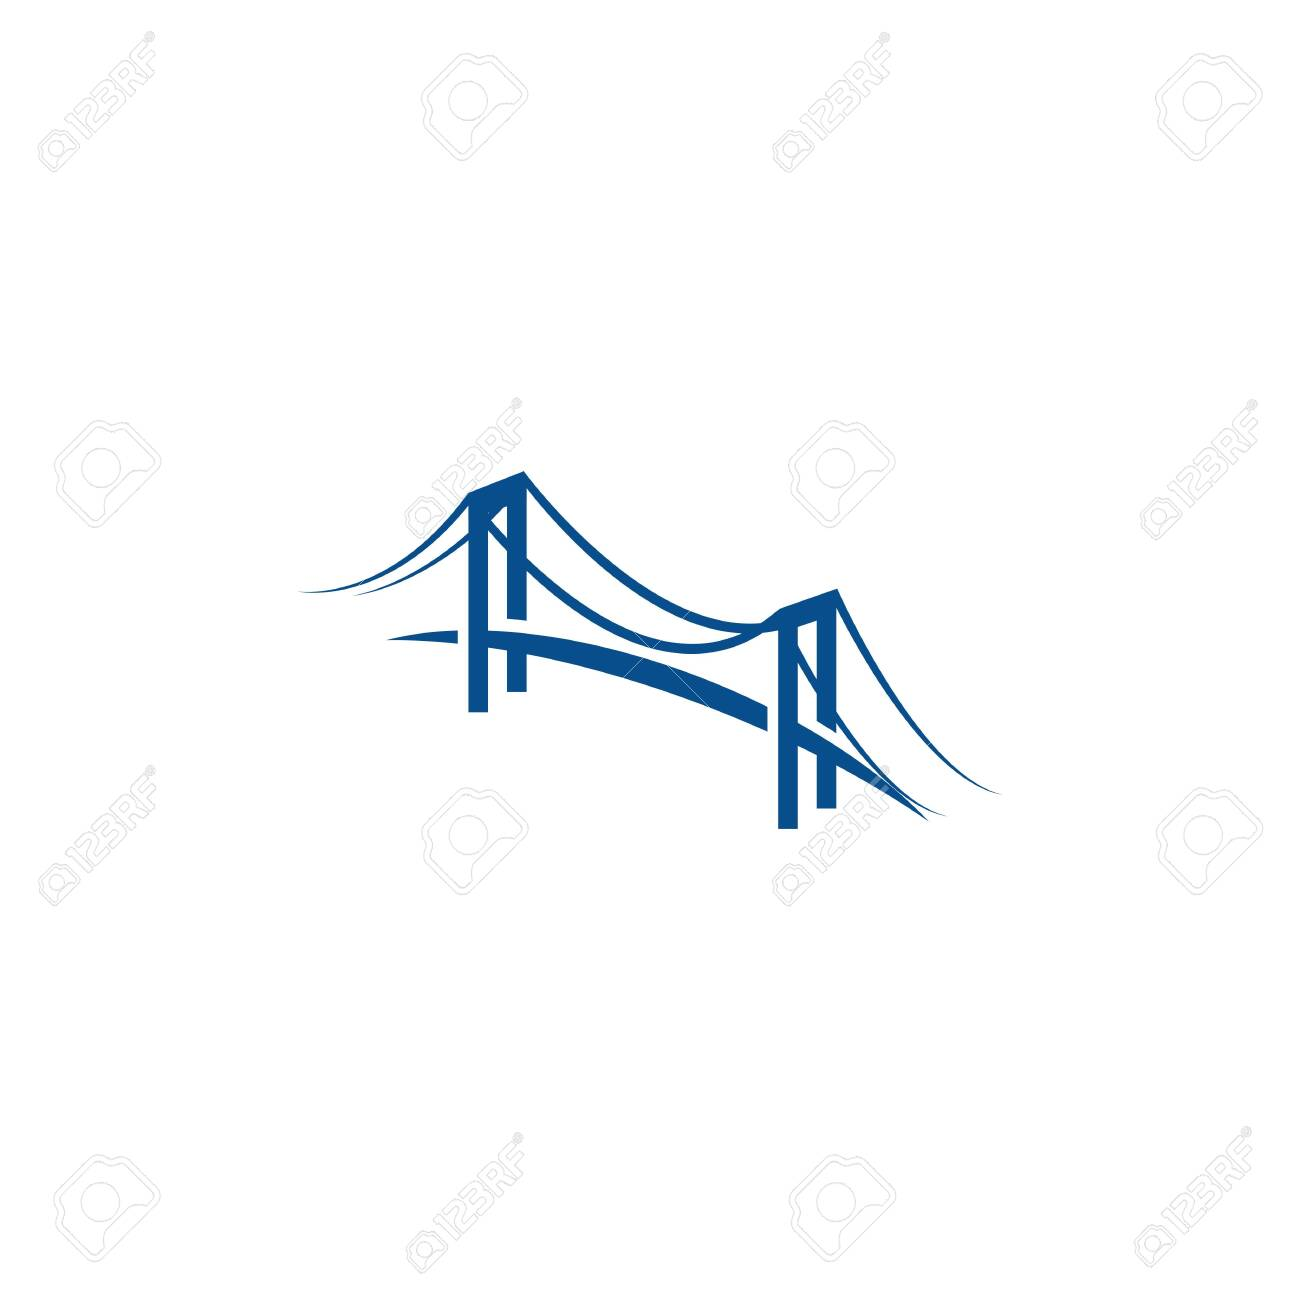 Bridge Logo Template vector icon illustration design - 139286364